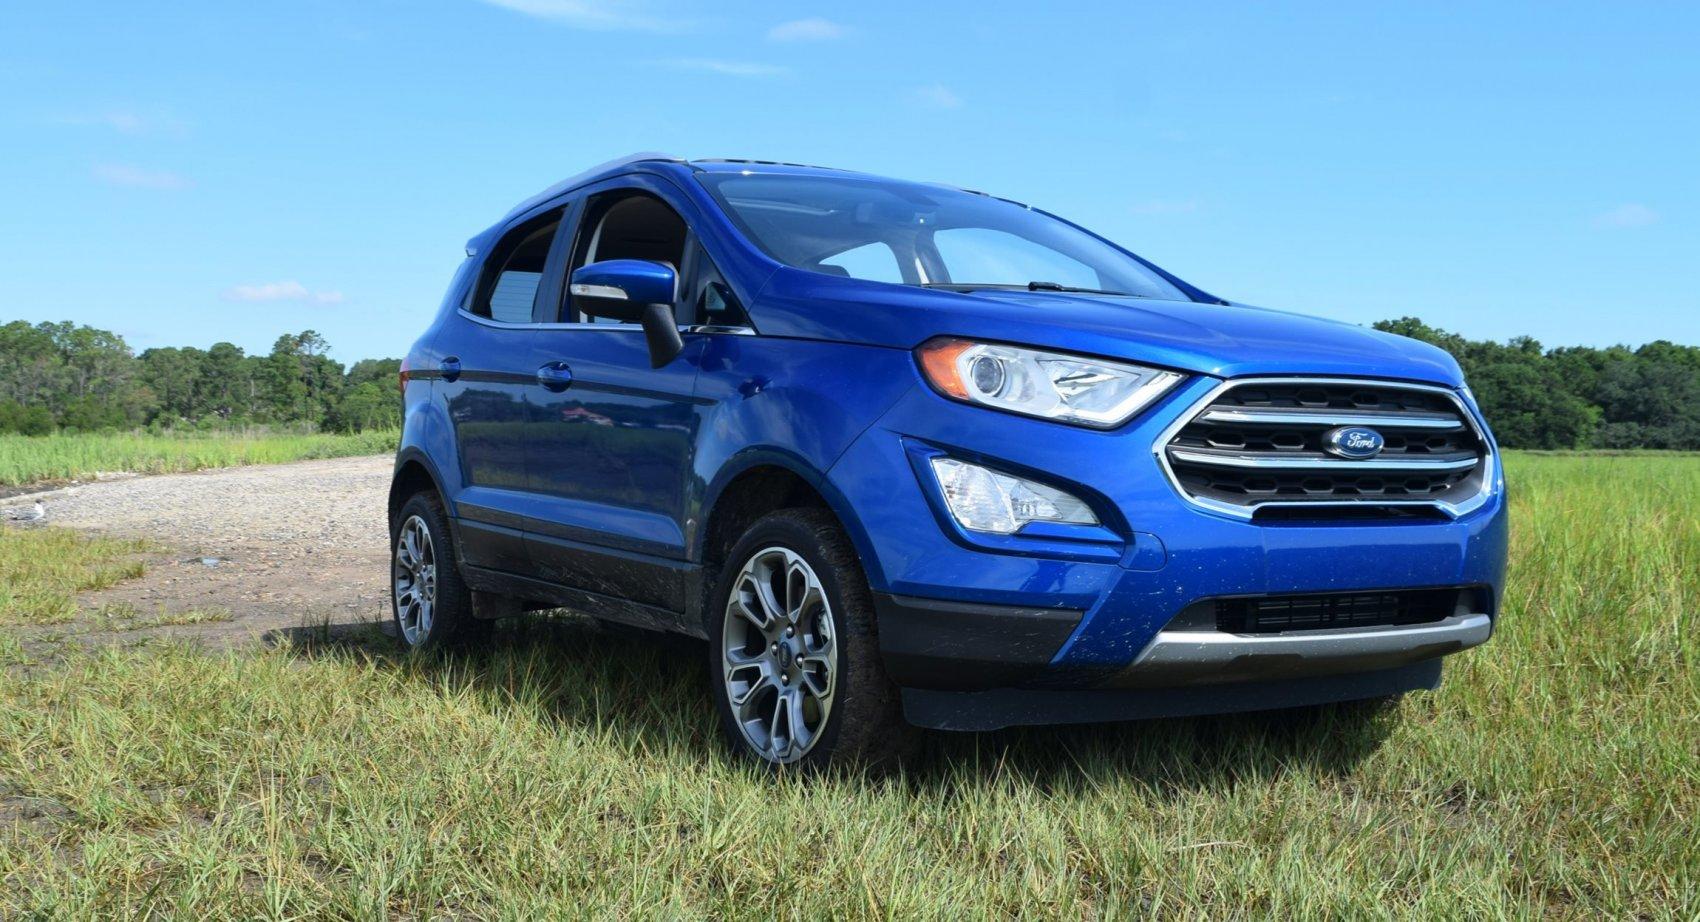 2018 Ford Ecosport 2 0l Titanium Awd Road Test Review W Drive